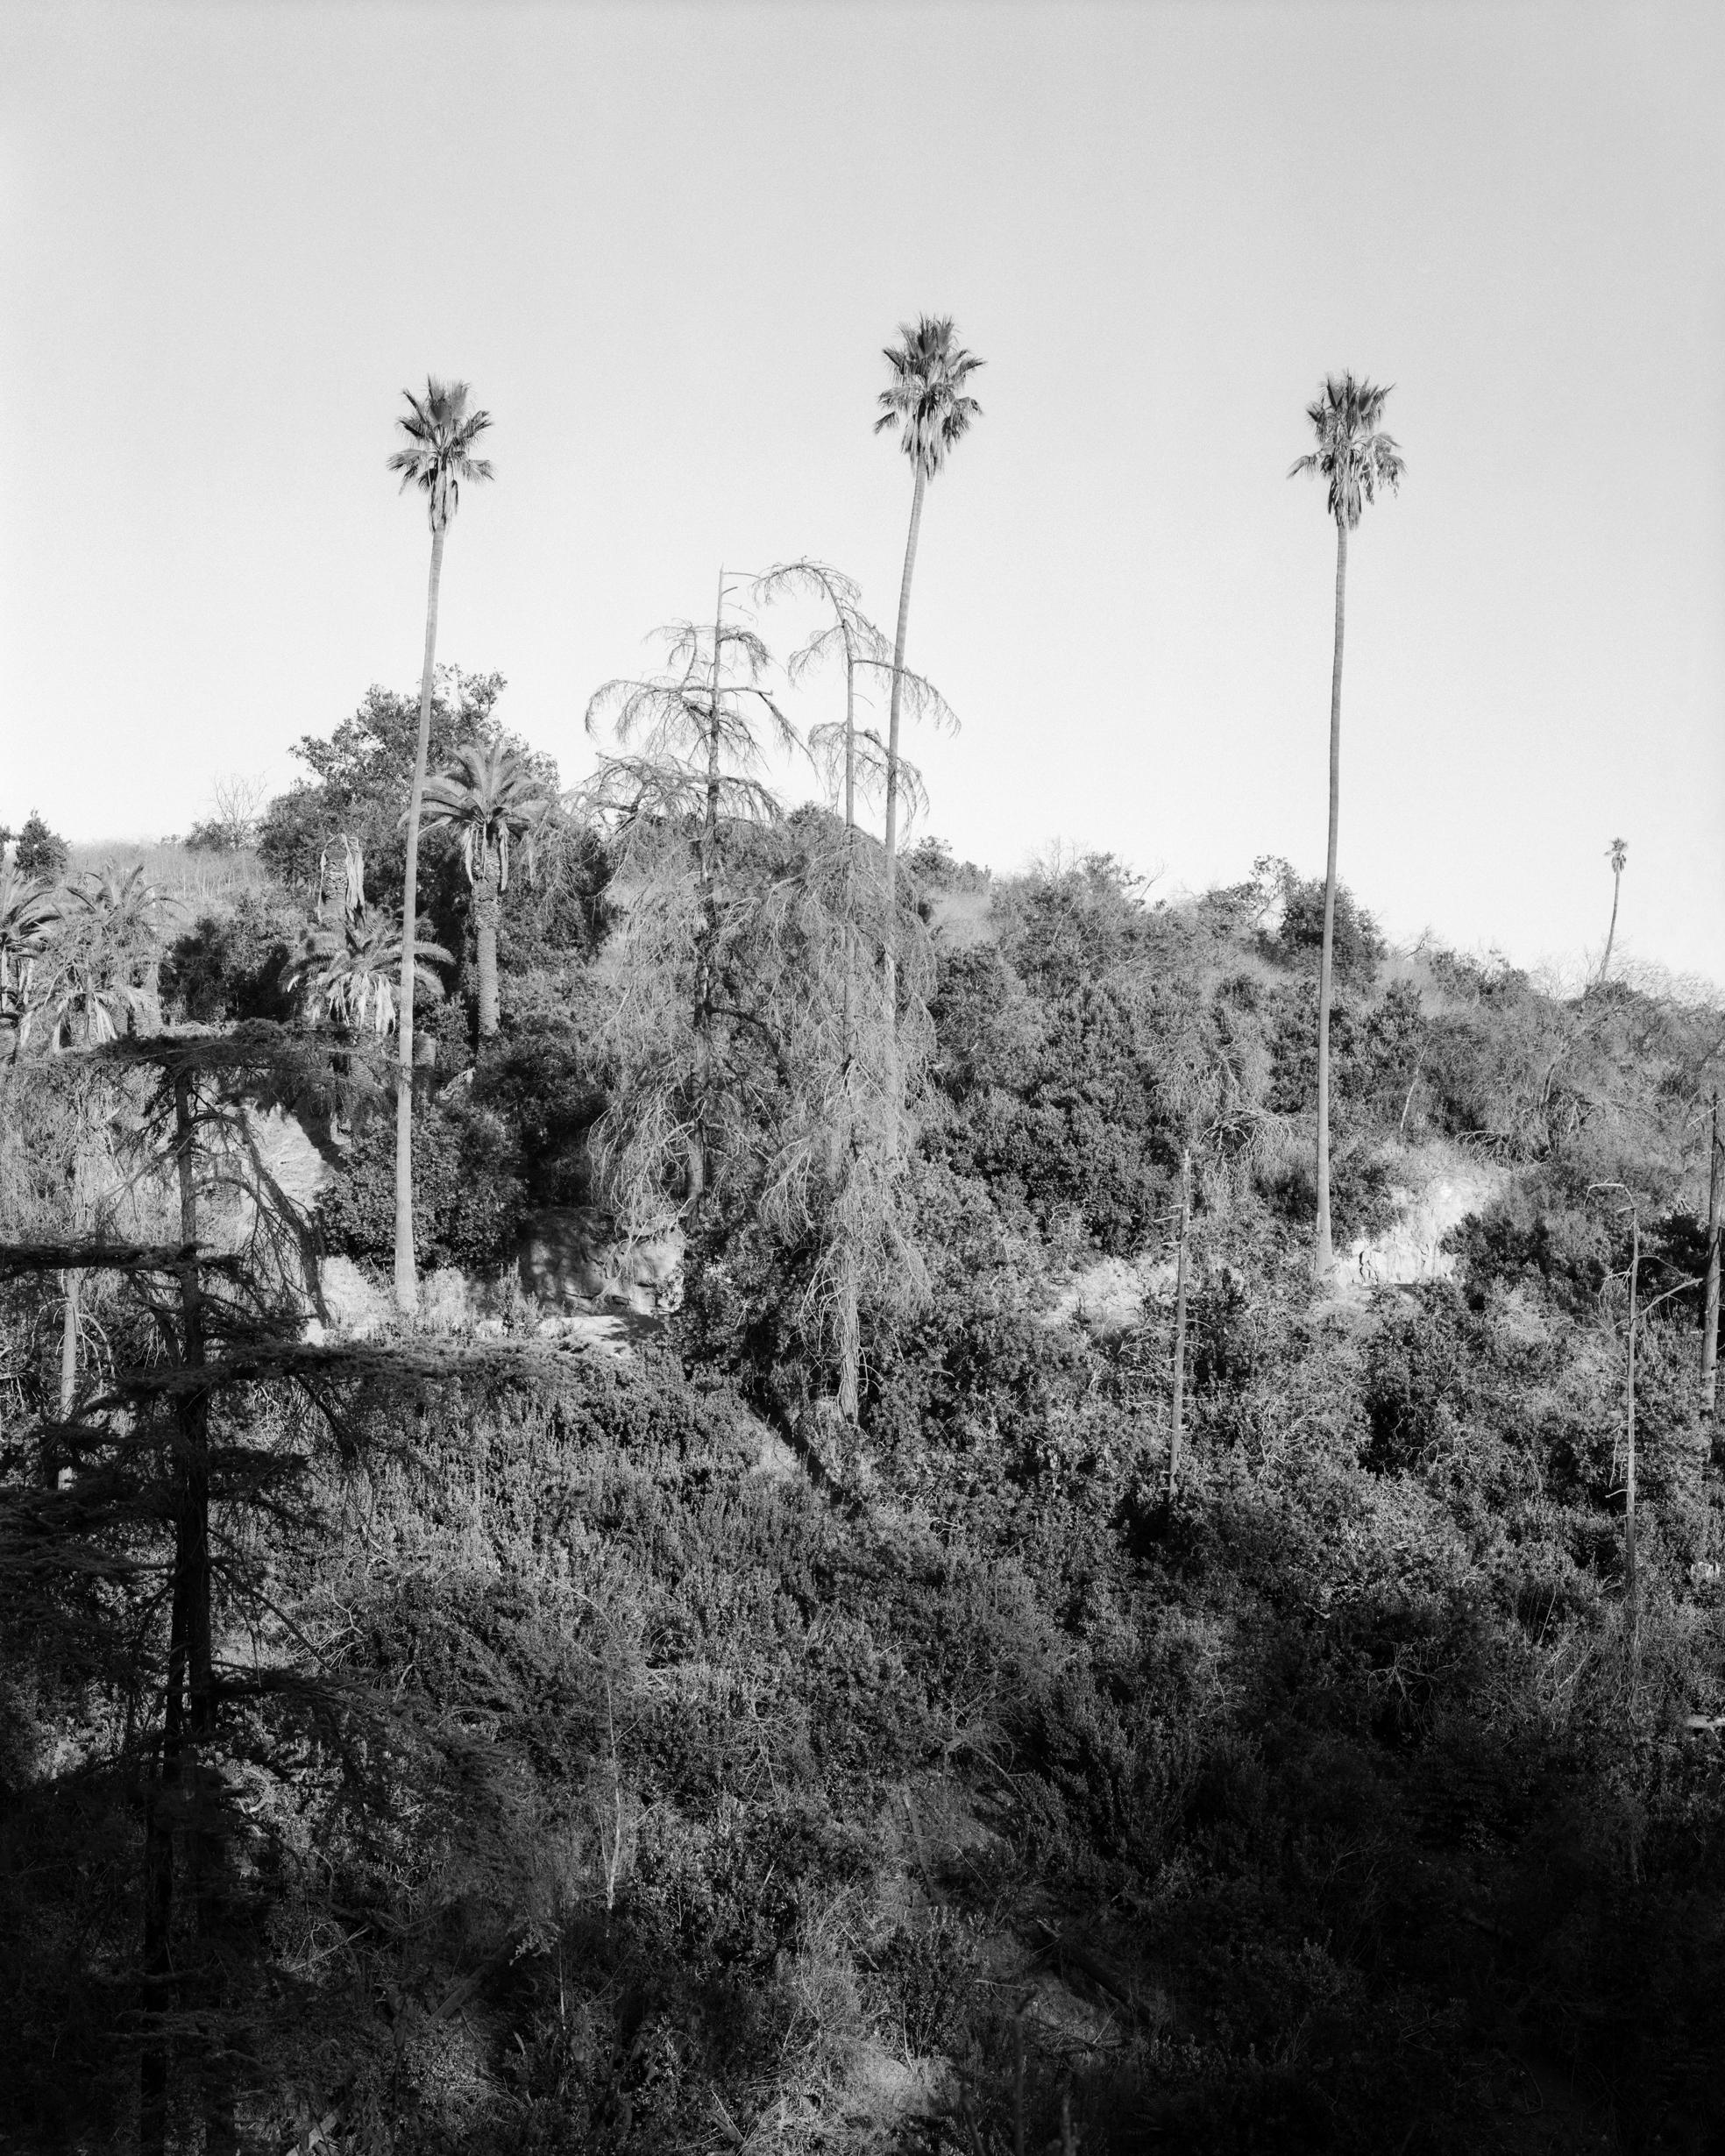 Psychscape 18 (Banner Ridge, CA) 2017